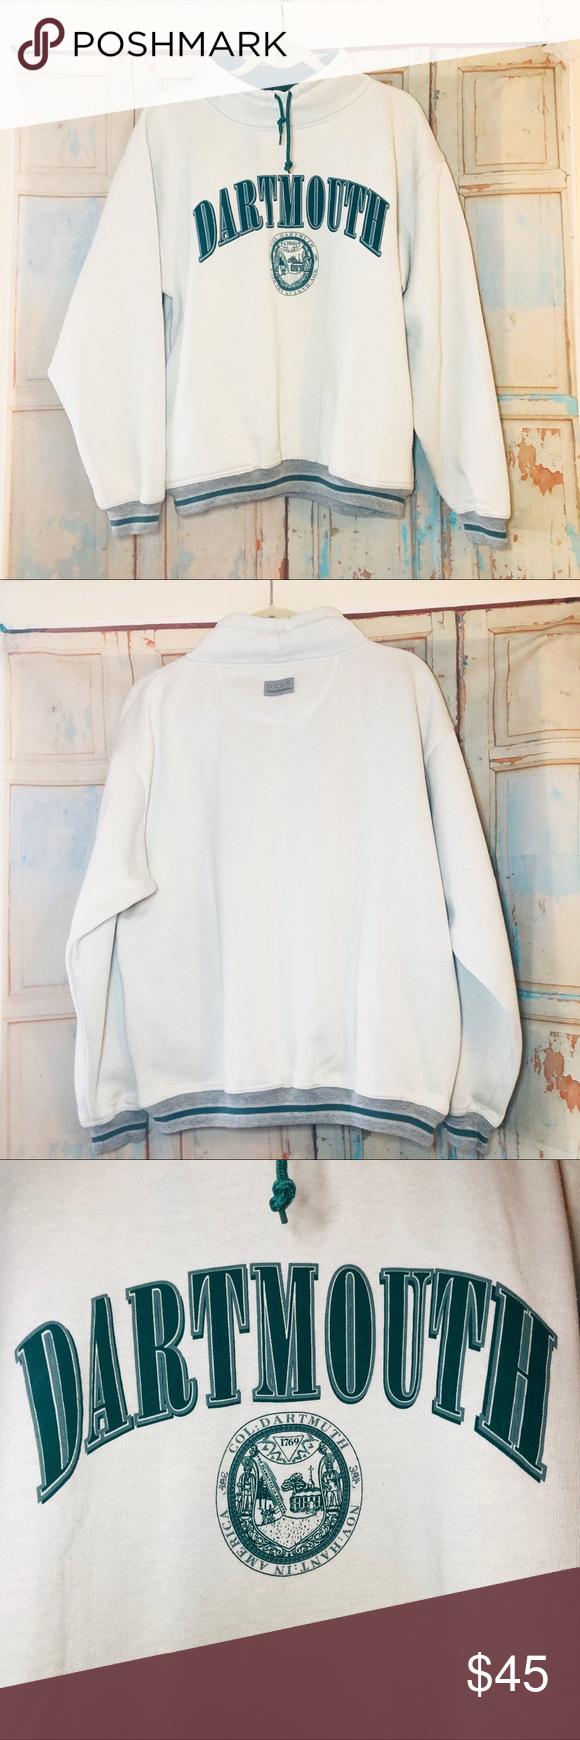 Dartmouth College Vintage Heavy Sweatshirt Gear Heavy Sweatshirts Sweatshirts Sweatshirt Shirt [ 1740 x 580 Pixel ]